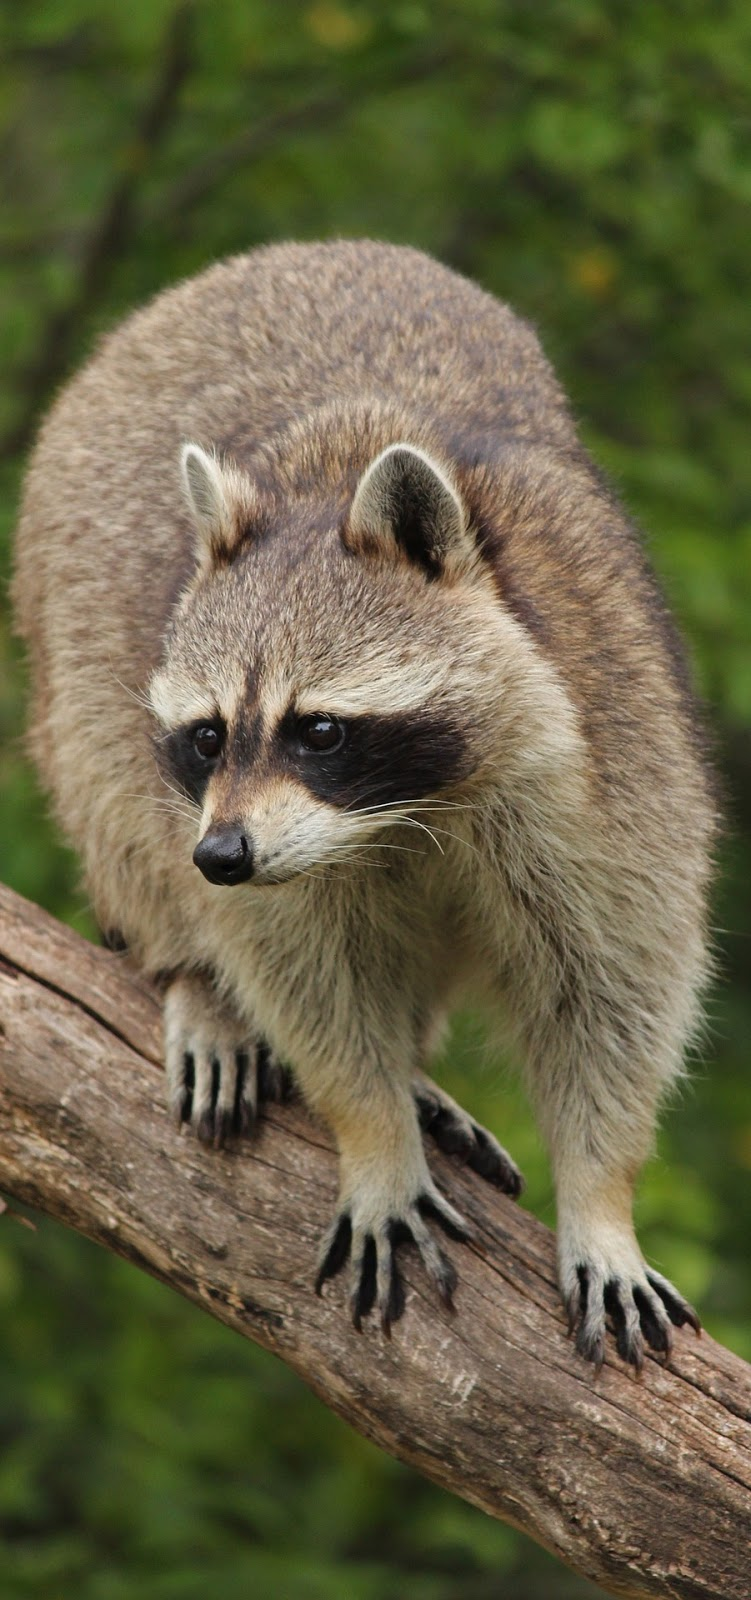 Raccoon on tree branch.